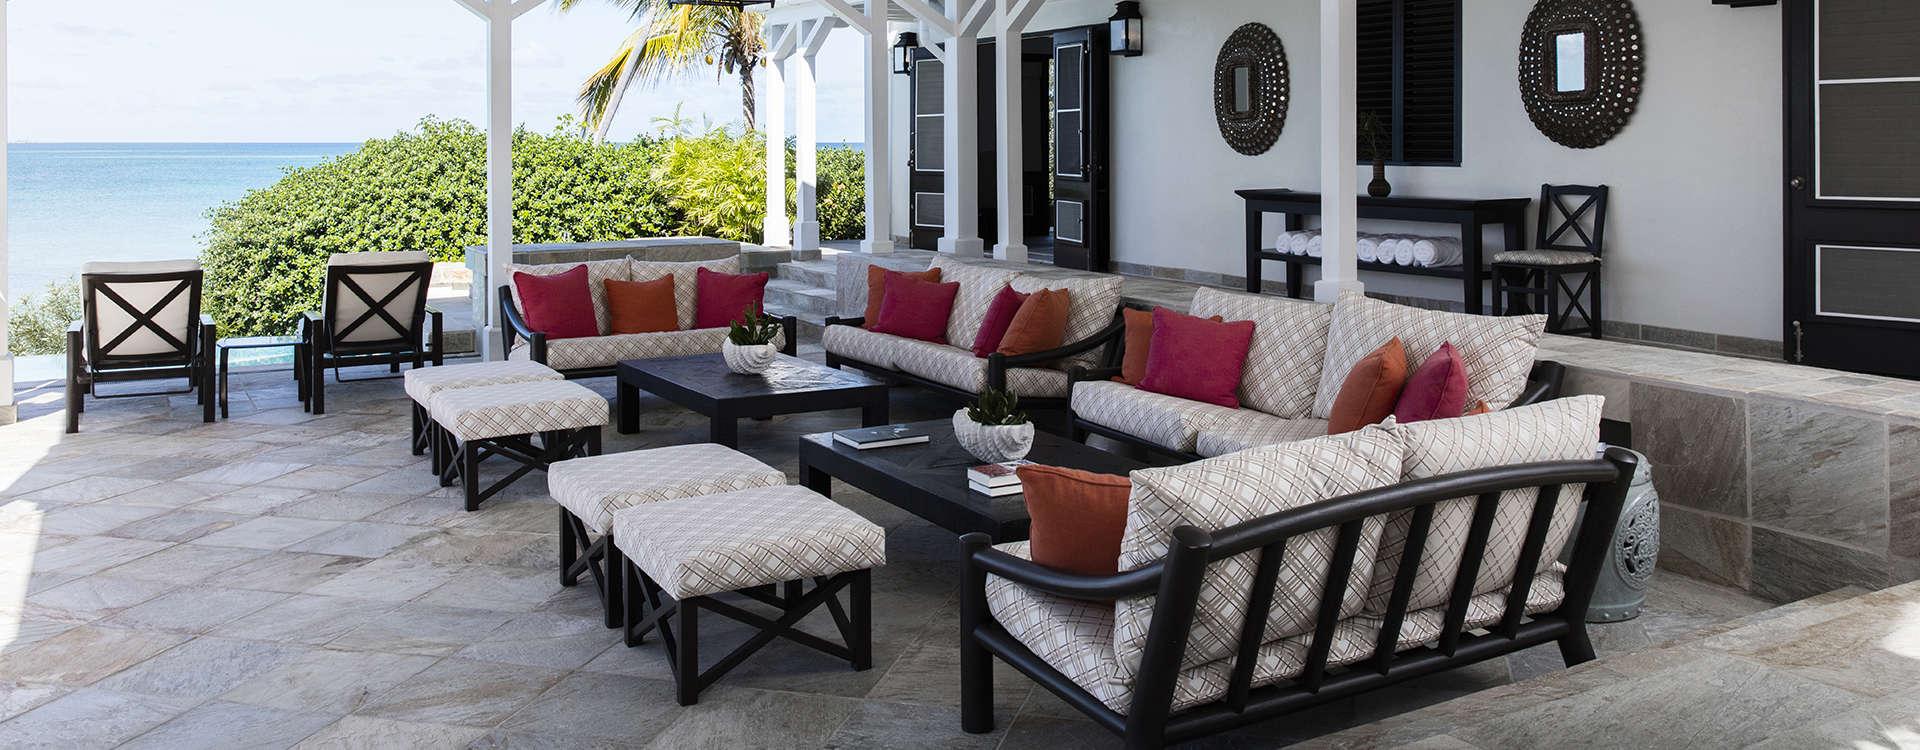 Luxury villa rentals caribbean - Antigua - Jumby bay - Les Palmiers - Image 1/7